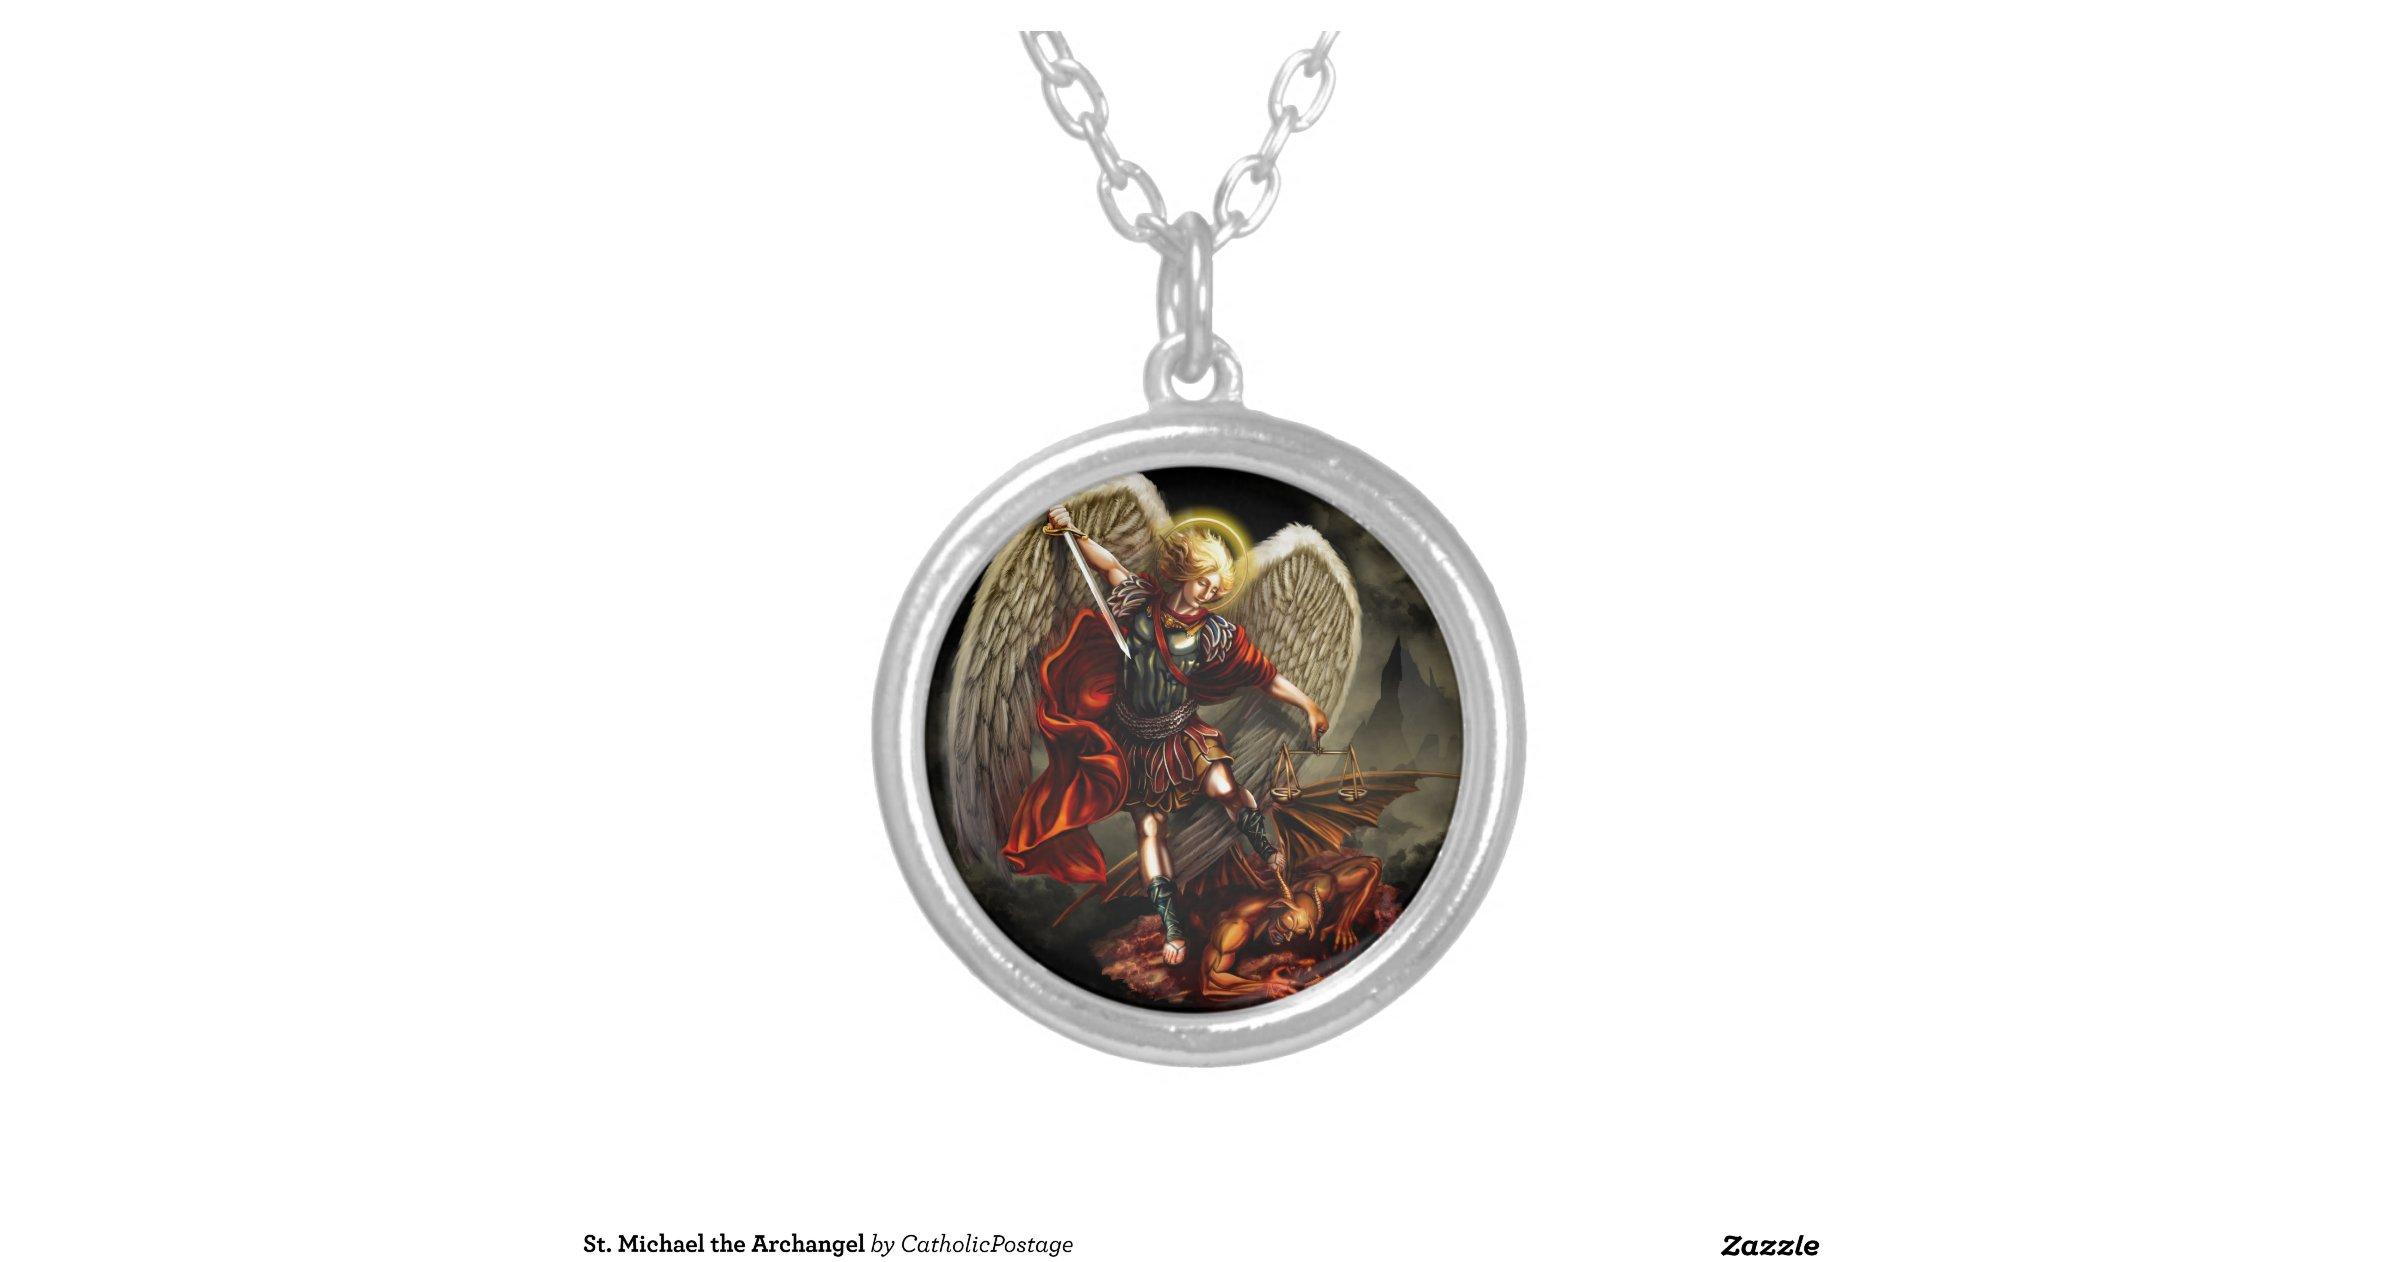 st michael the archangel round pendant necklace